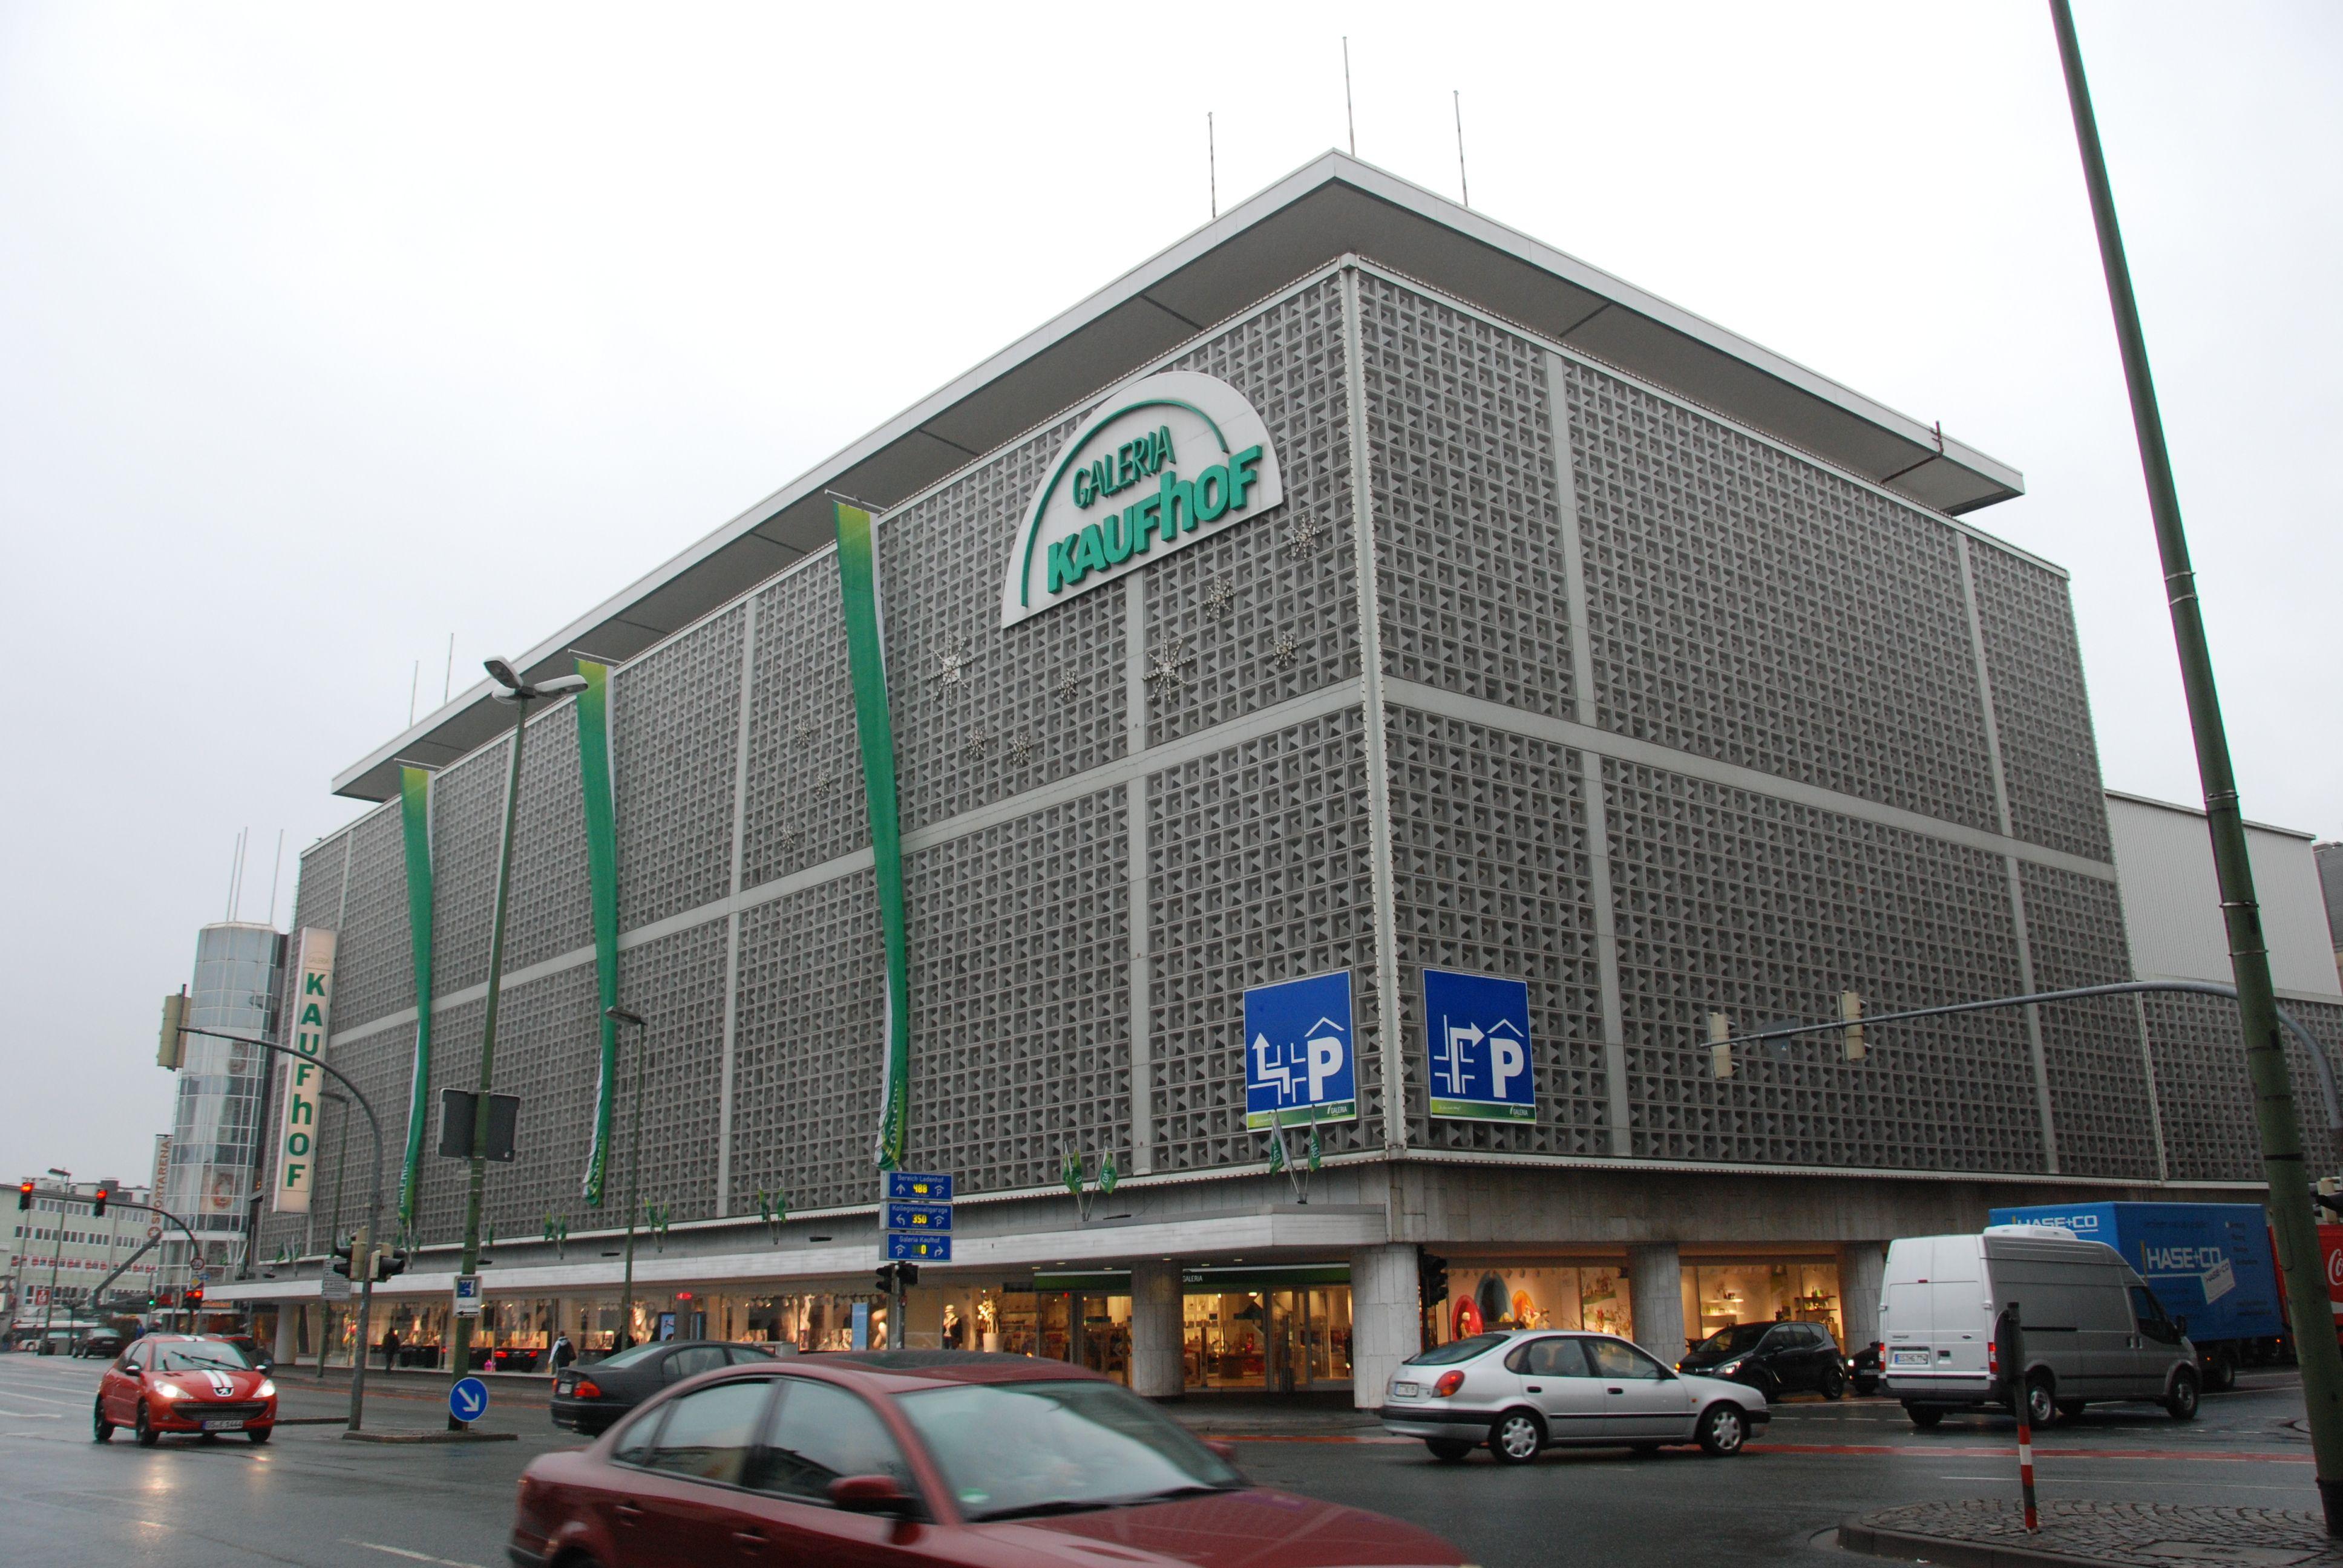 galeria kaufhof kiel